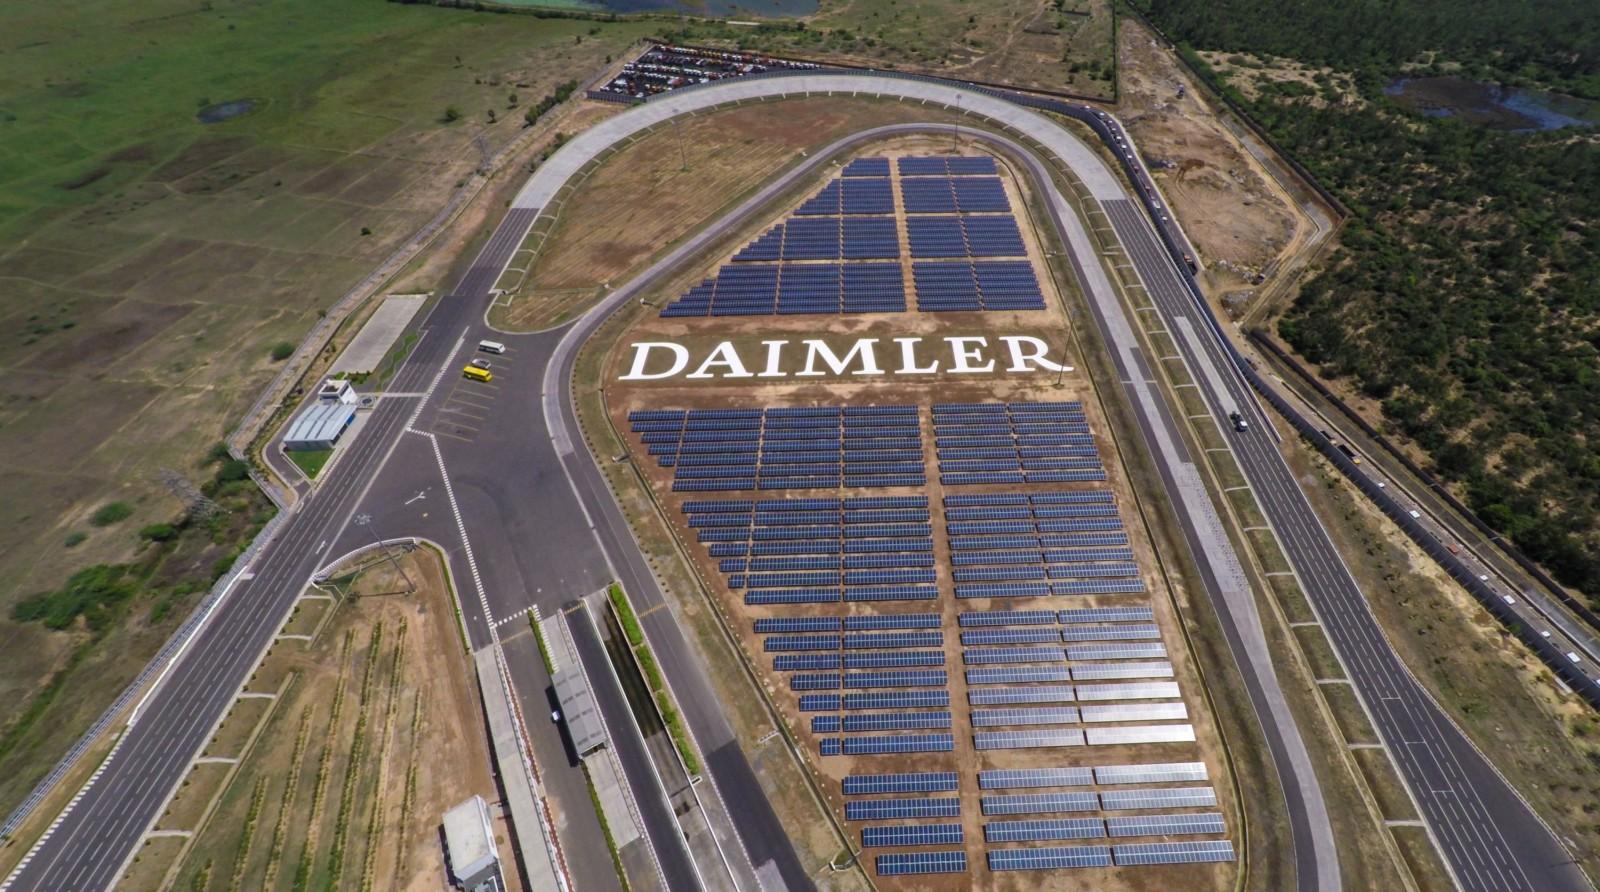 Daimler India - photovolatics expansion - 1